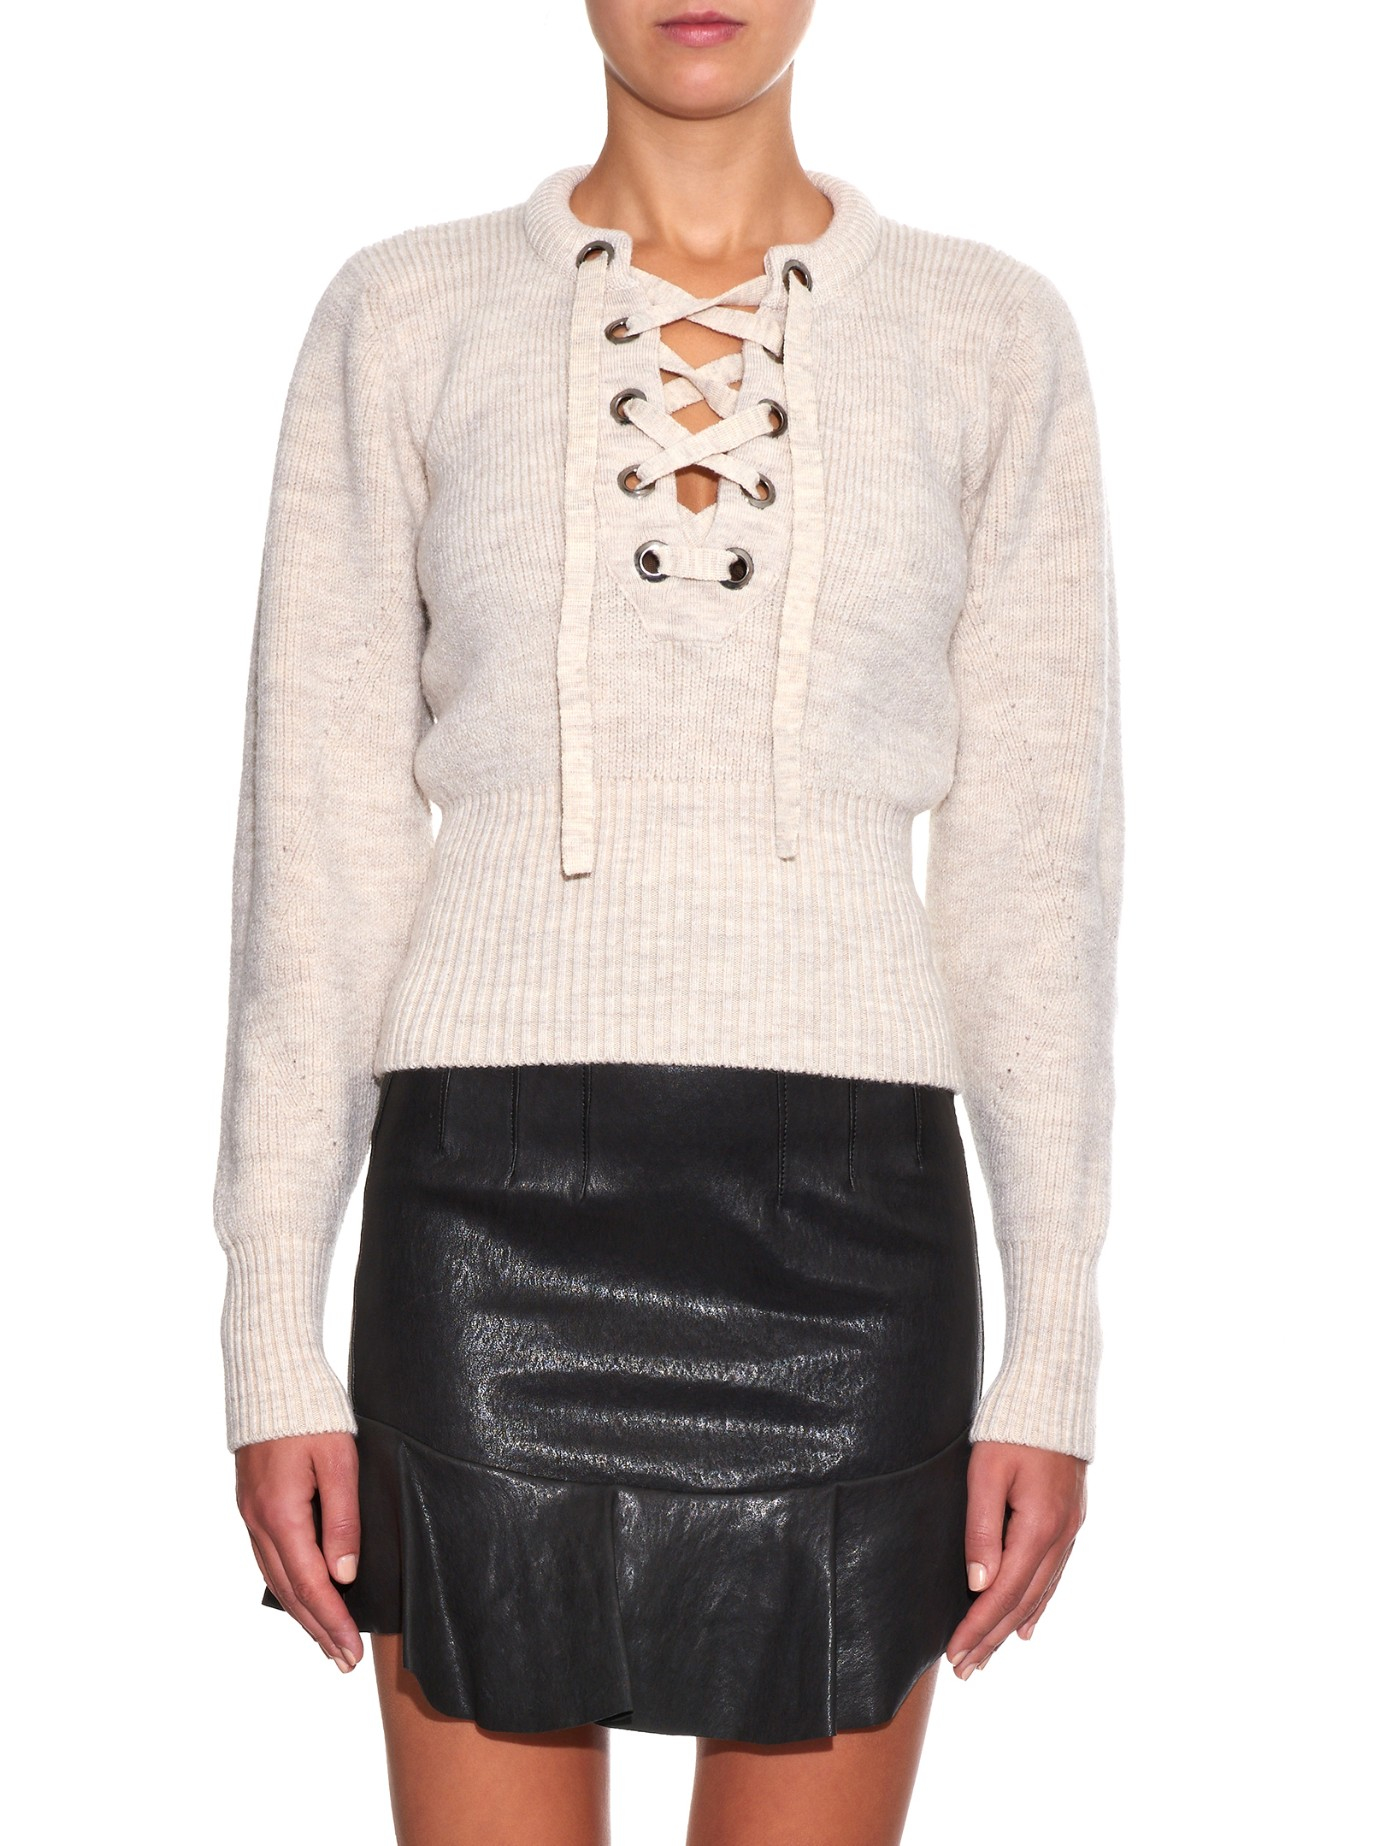 Lacy jumper - White Isabel Marant Release Dates Sale Online GSOgCWJv9z